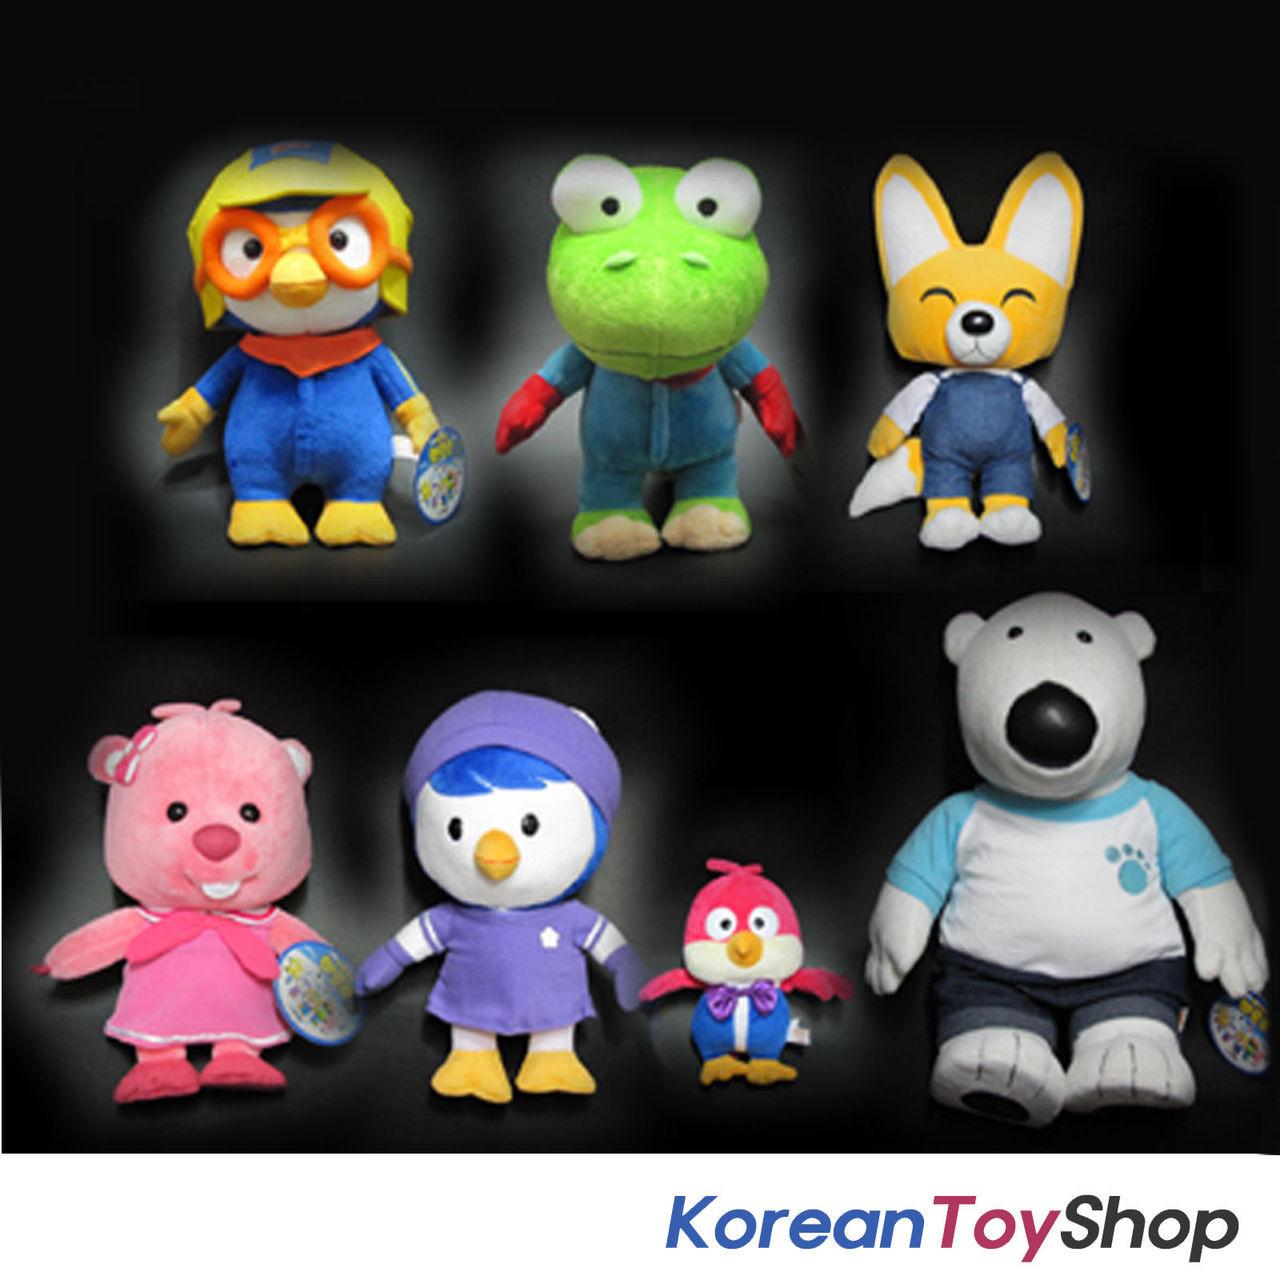 Korea Cartoon Pororo Little Penguin Petty Eddy Crong Loopy Poby Plush Toy Doll